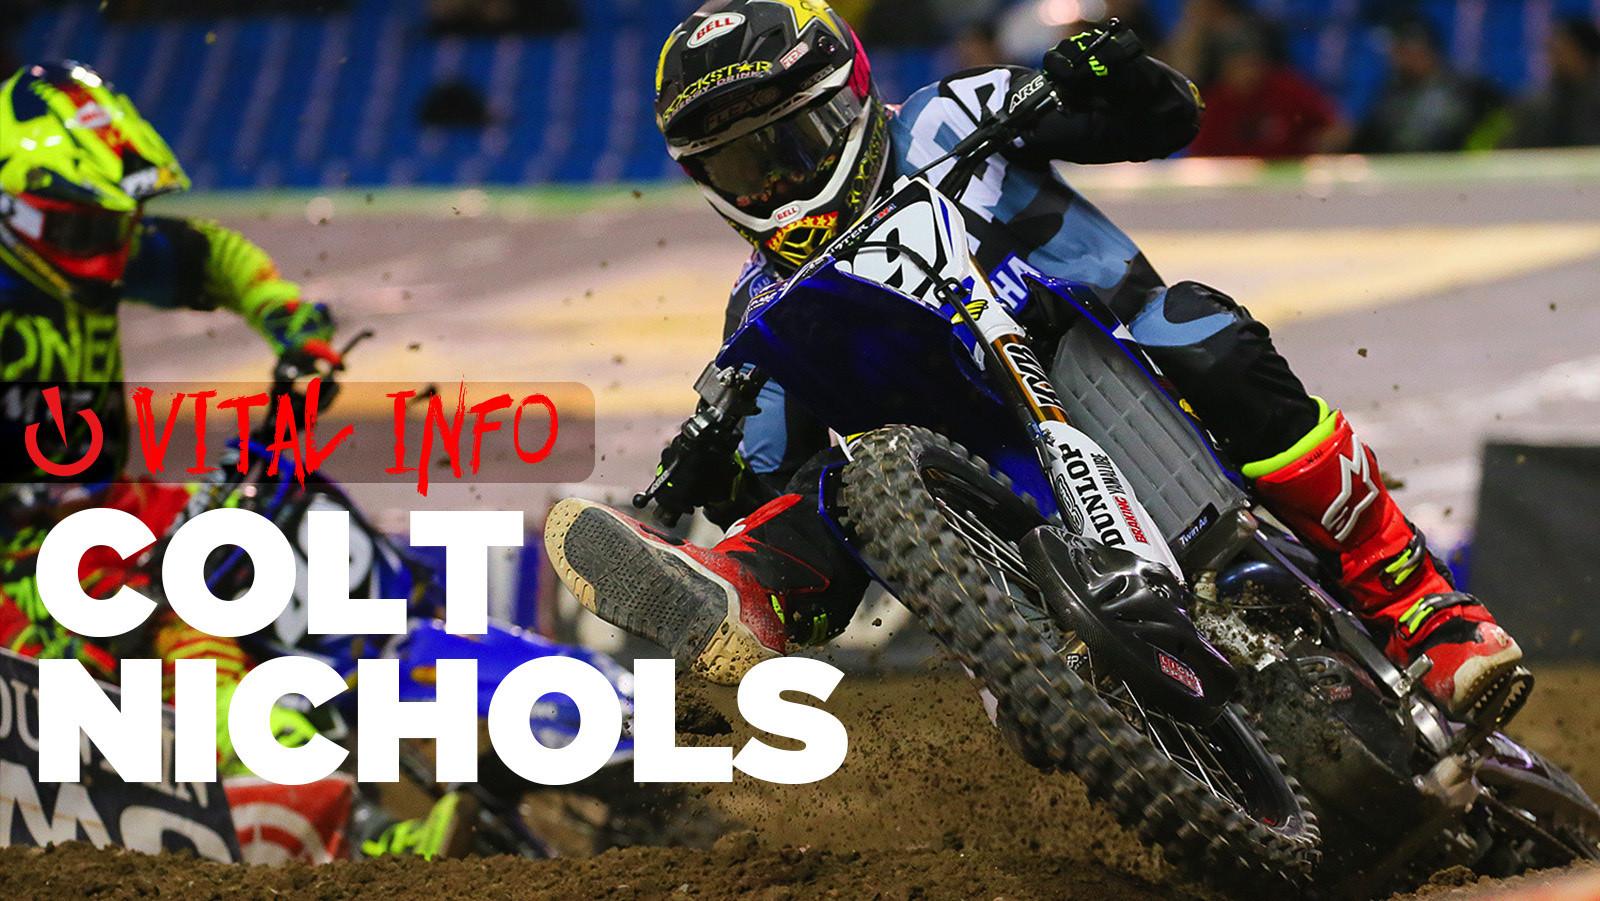 Vital Info: Colt Nichols